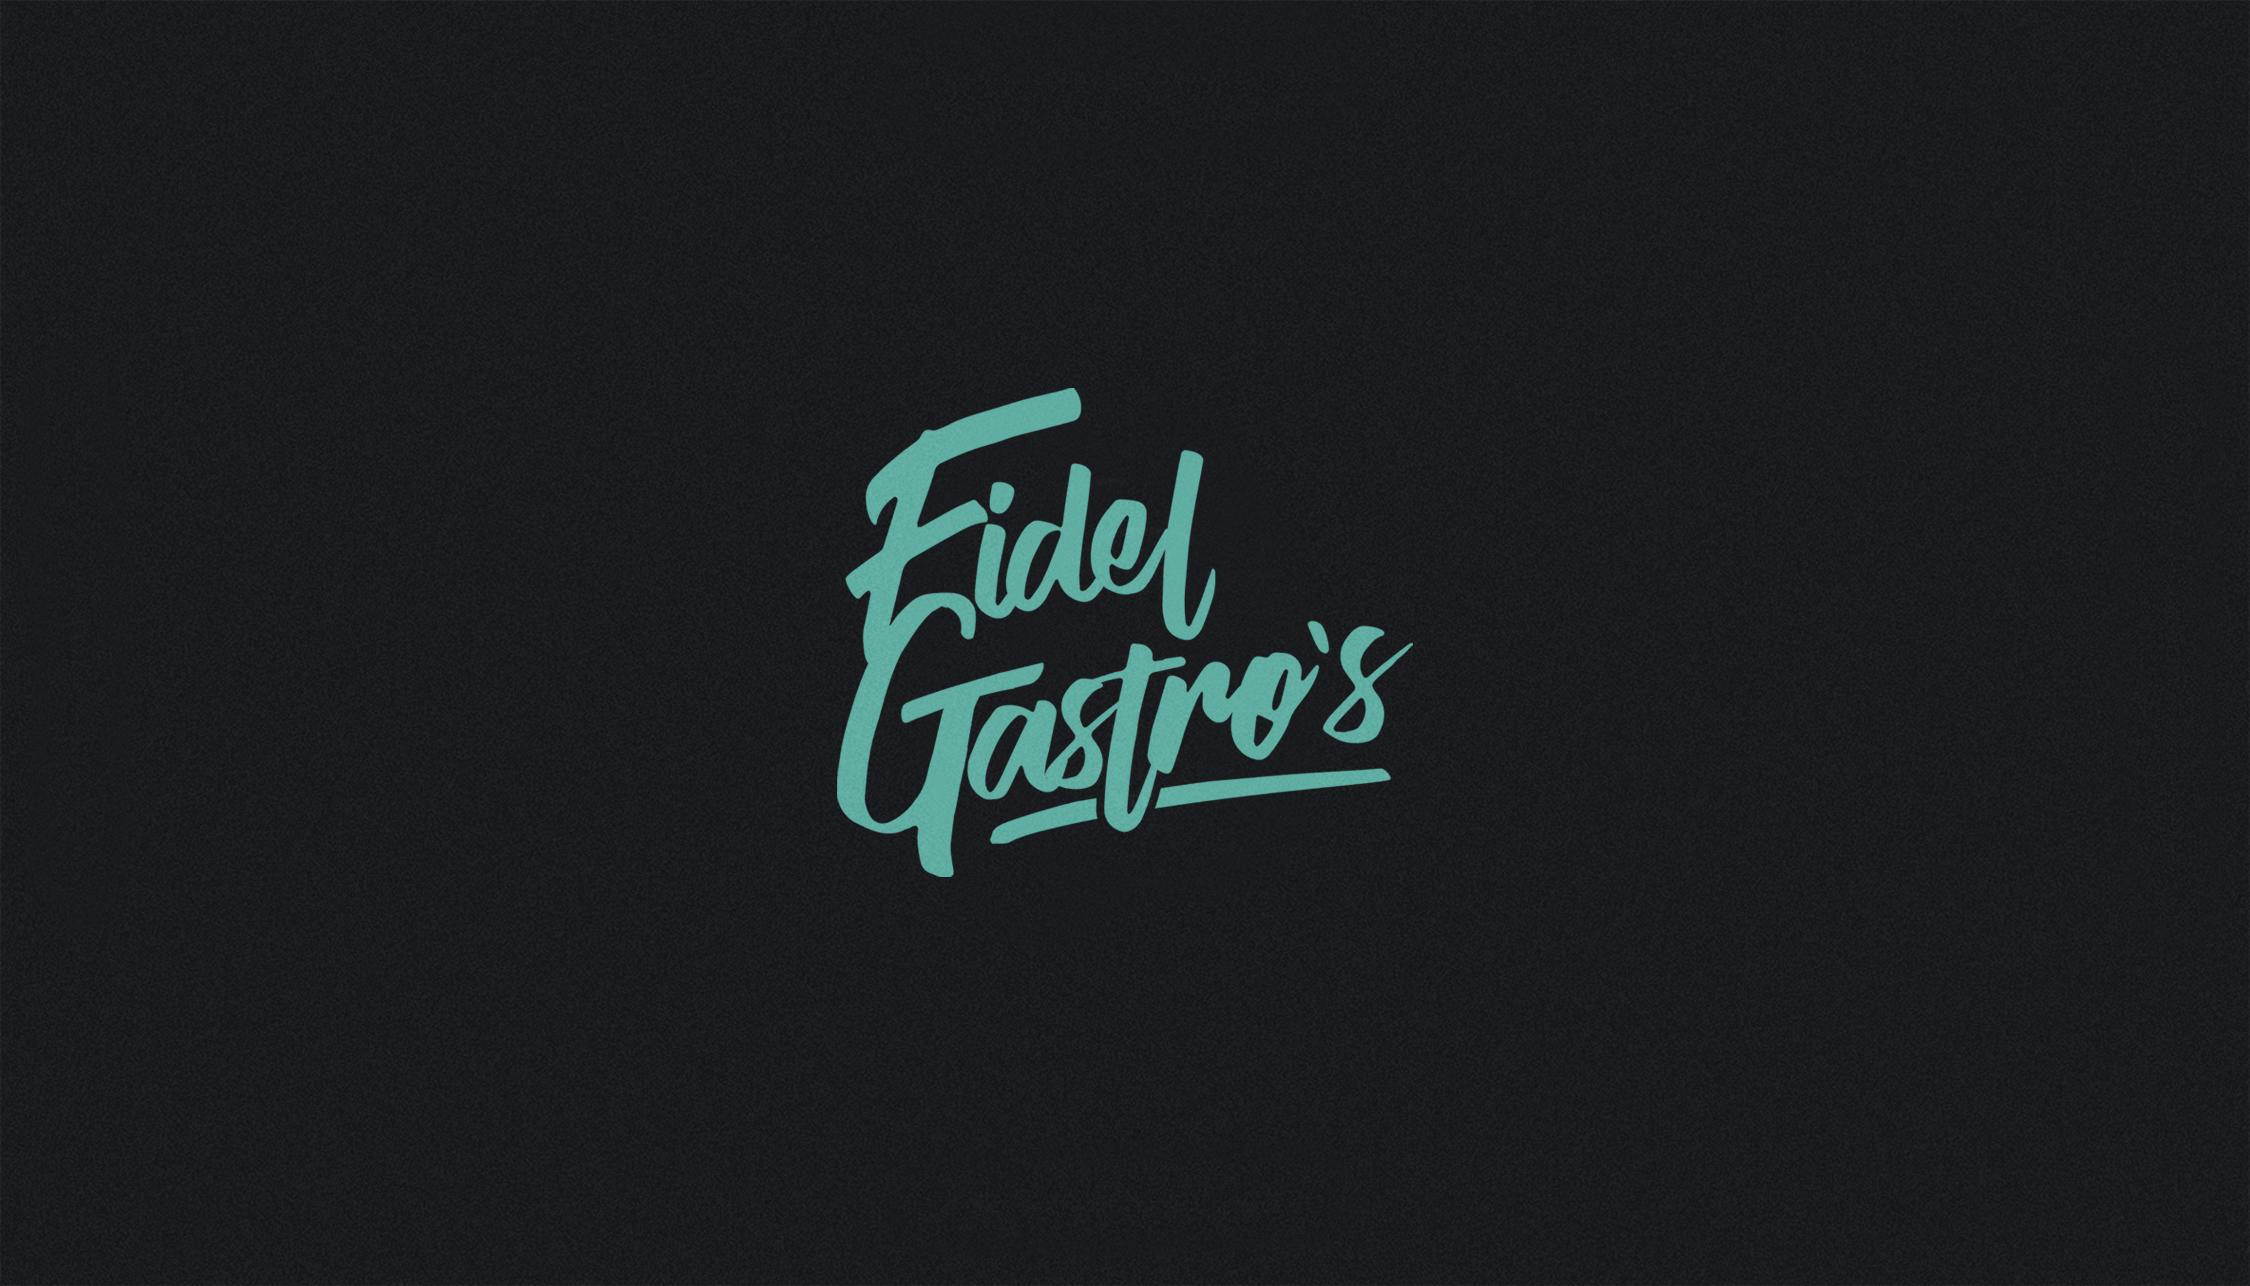 FIDEL GASTROS.jpg